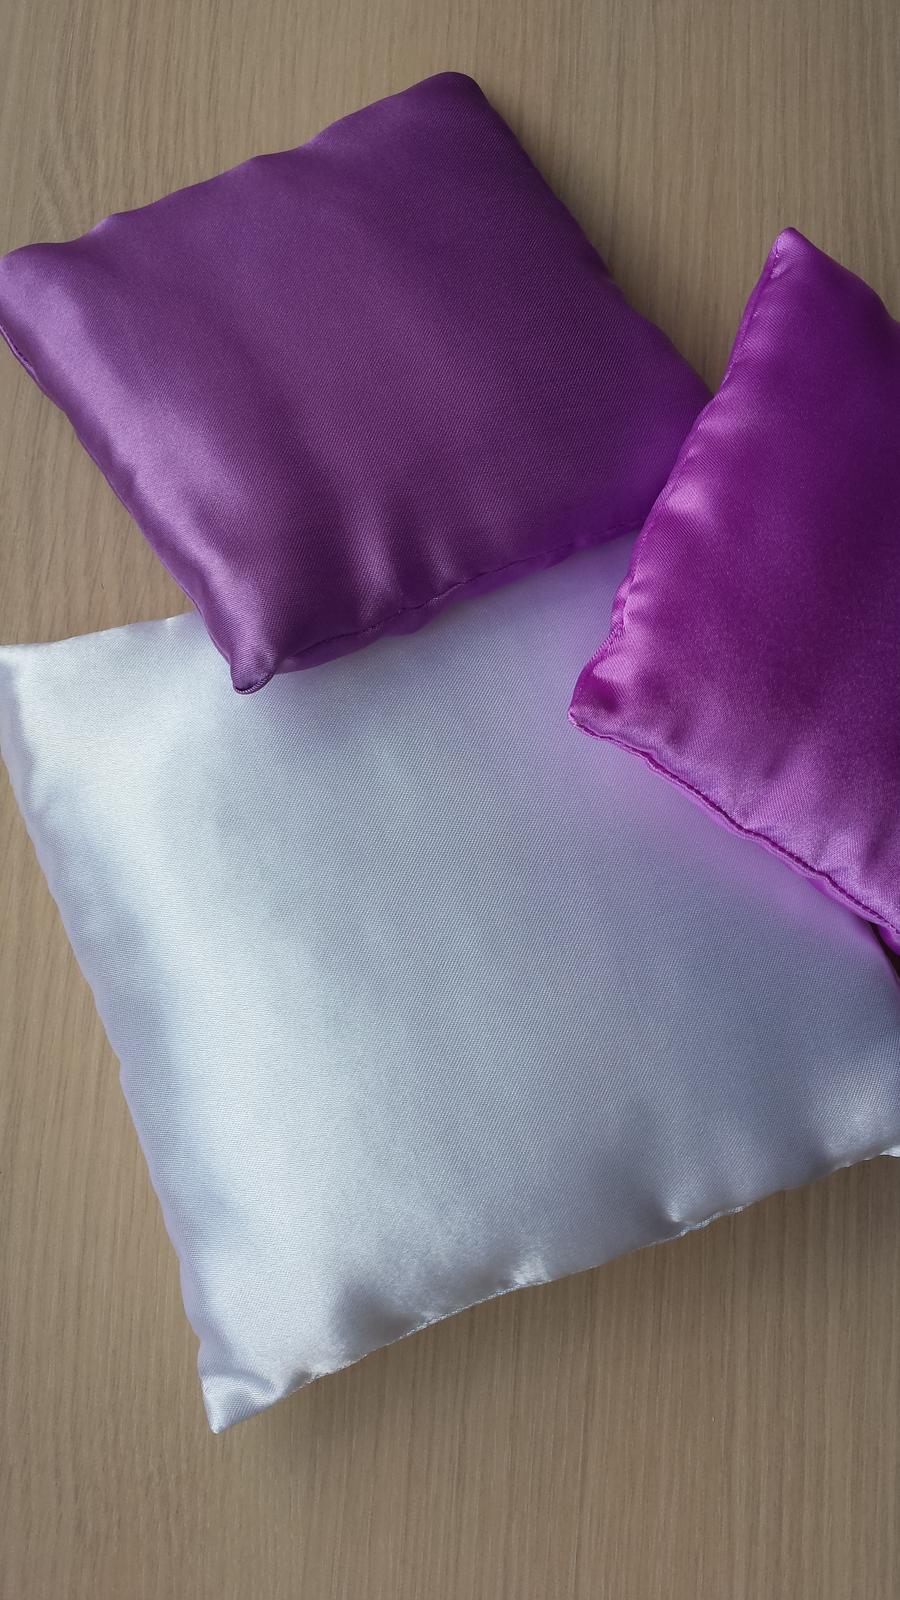 VÝPRODEJ - Bily 18x18 cm, fialovy a ruzovofialovy rozmer 14x14 cm..cena 60 KC/kus